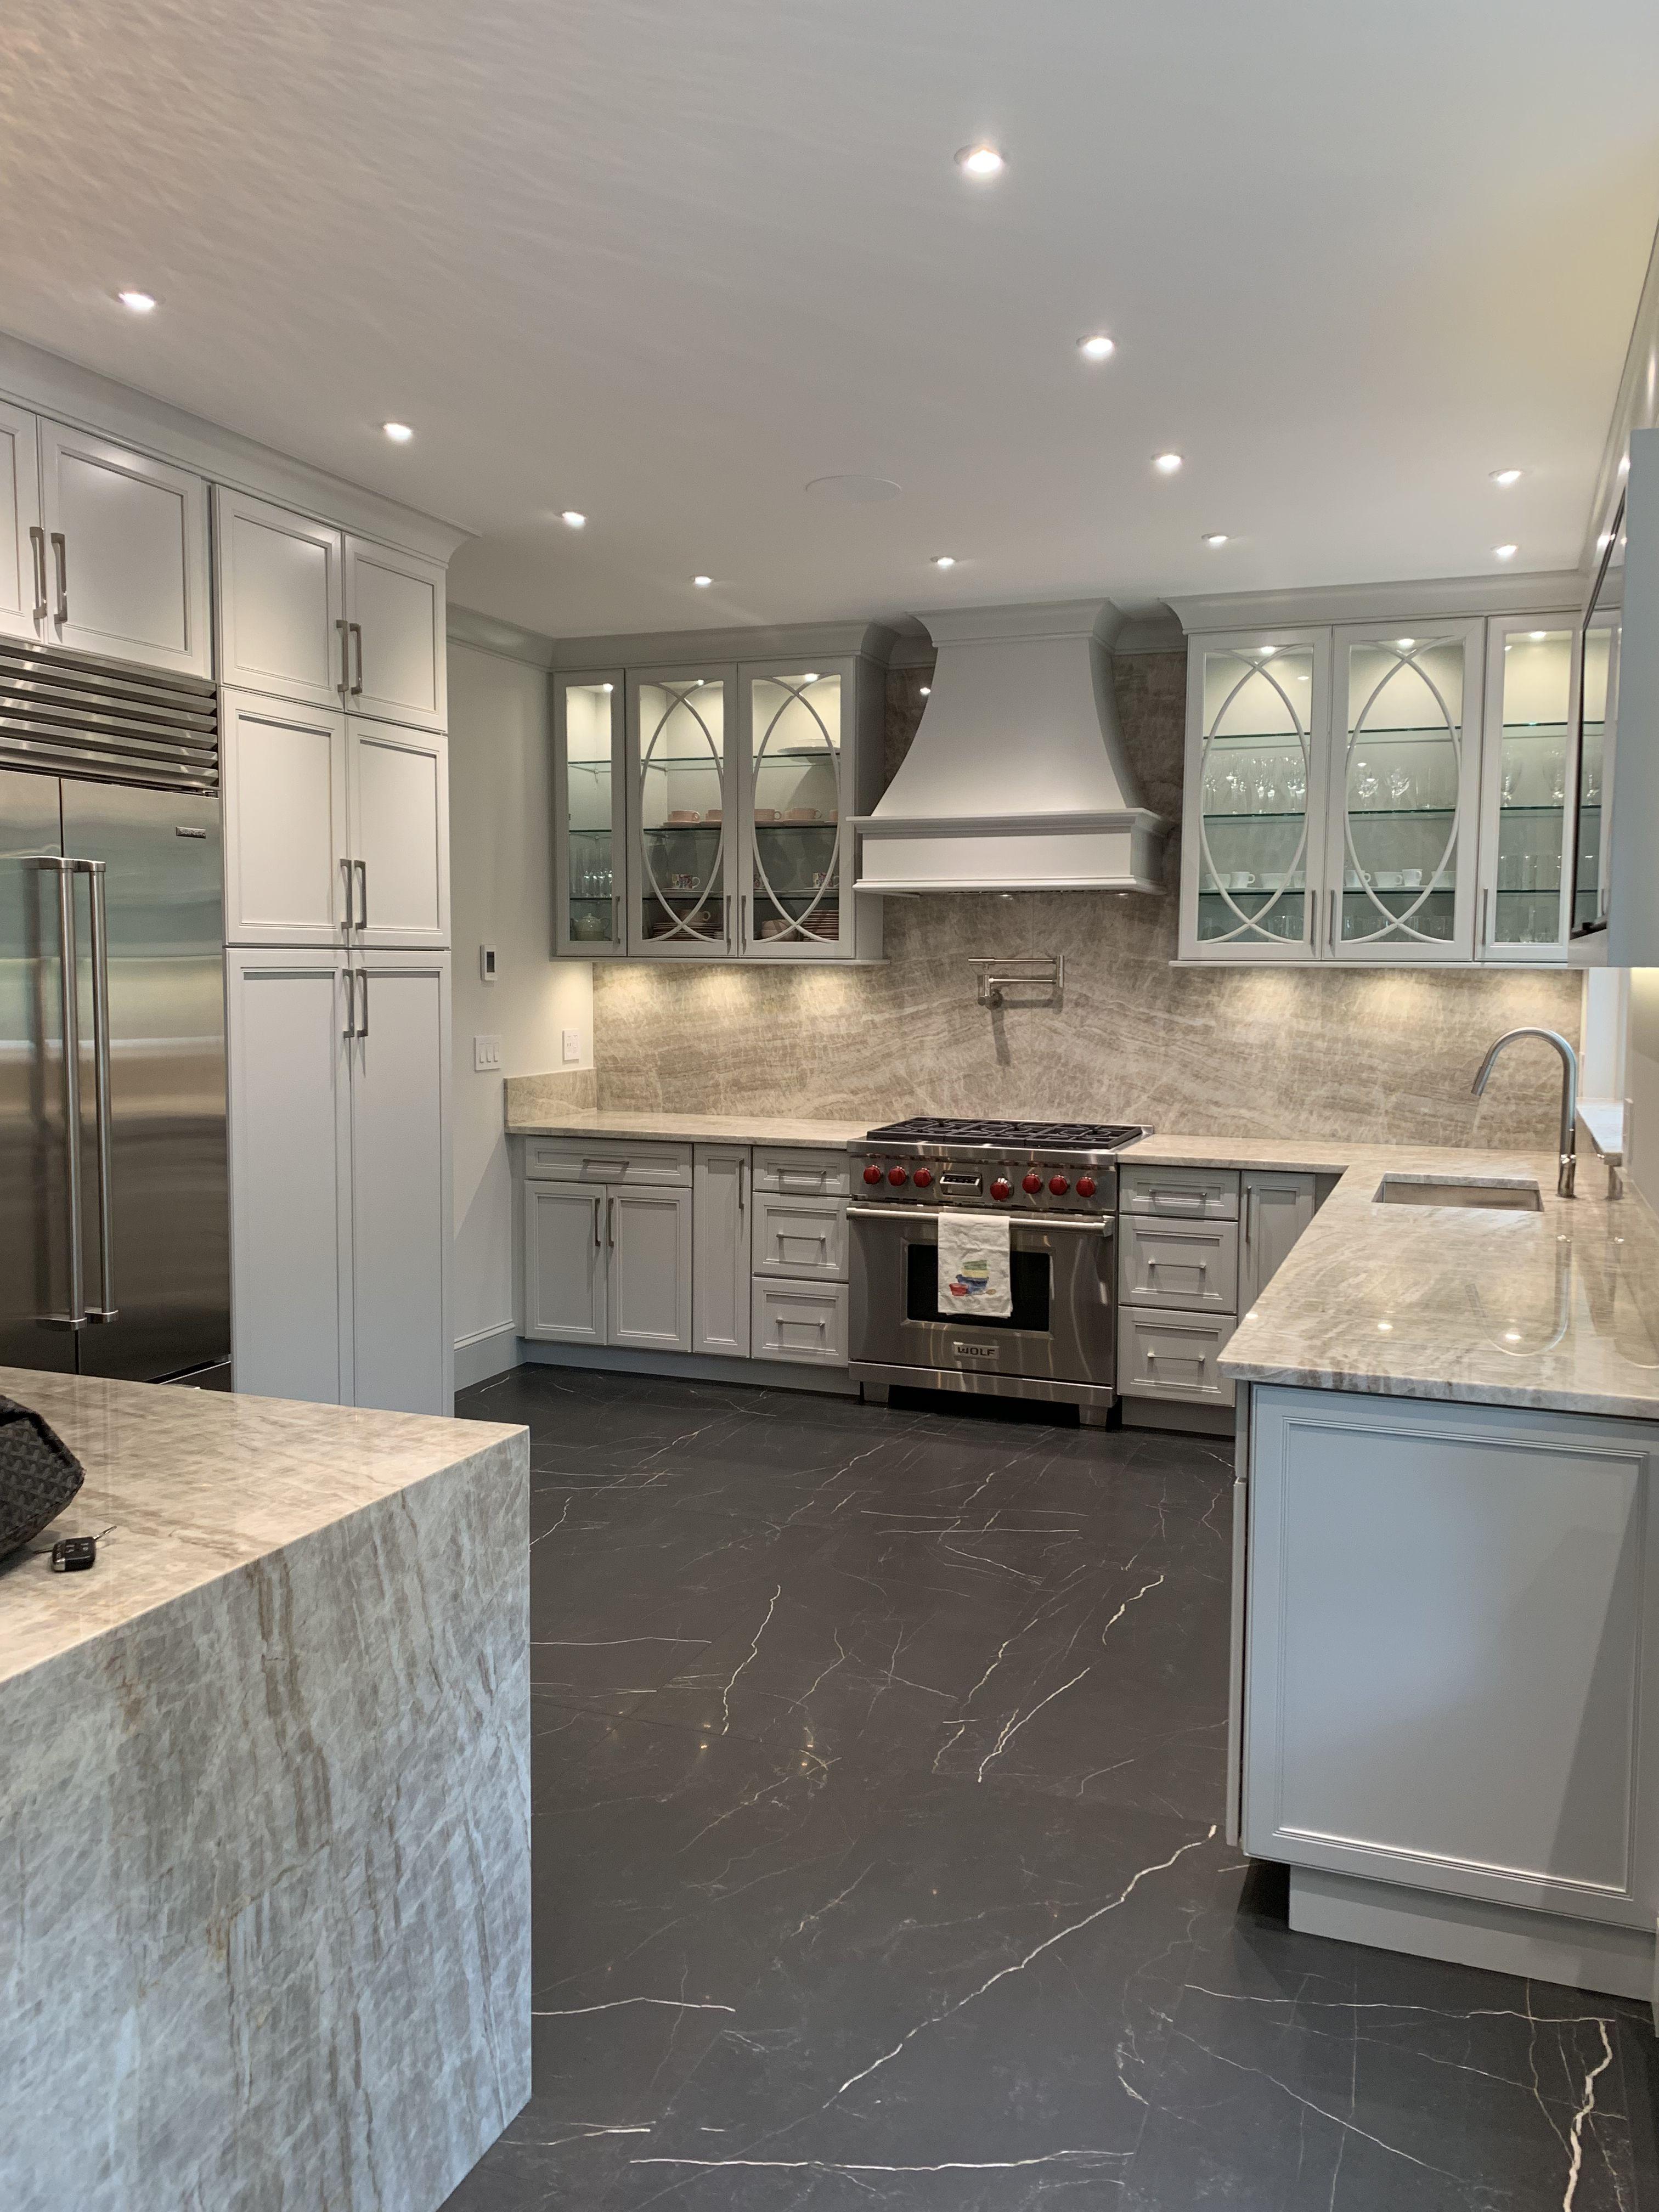 New York Kitchen Renovation Featuring Kraftmaid Cabinetry Kitchen Renovation Luxury Kitchen Design Kraftmaid